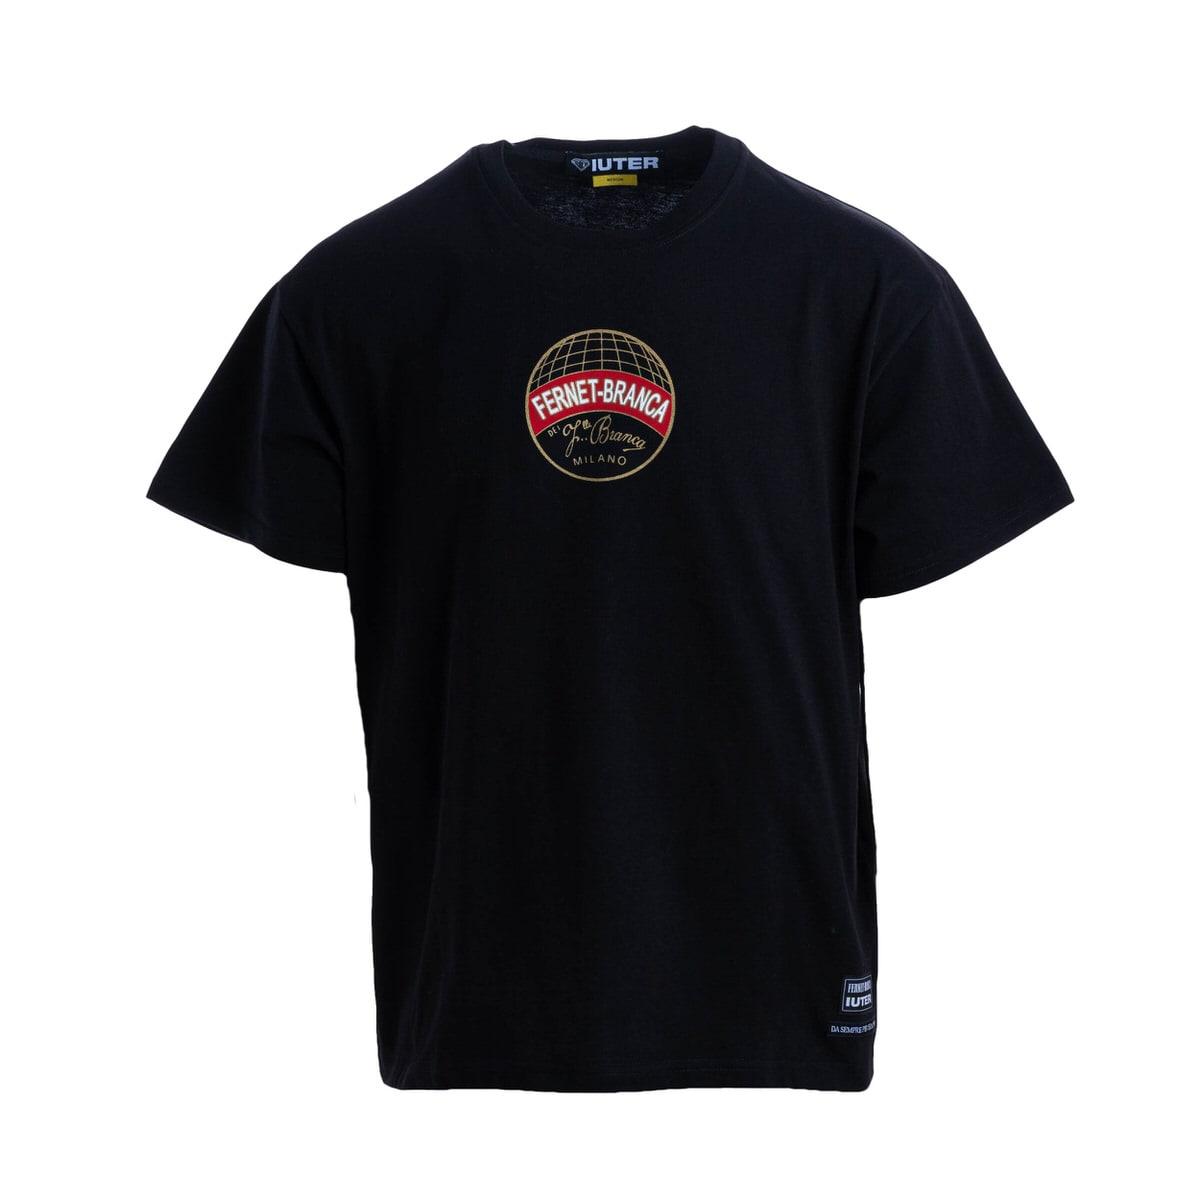 Iuter Iuter X Fernet Branca coin Tee Cotton T-shirt